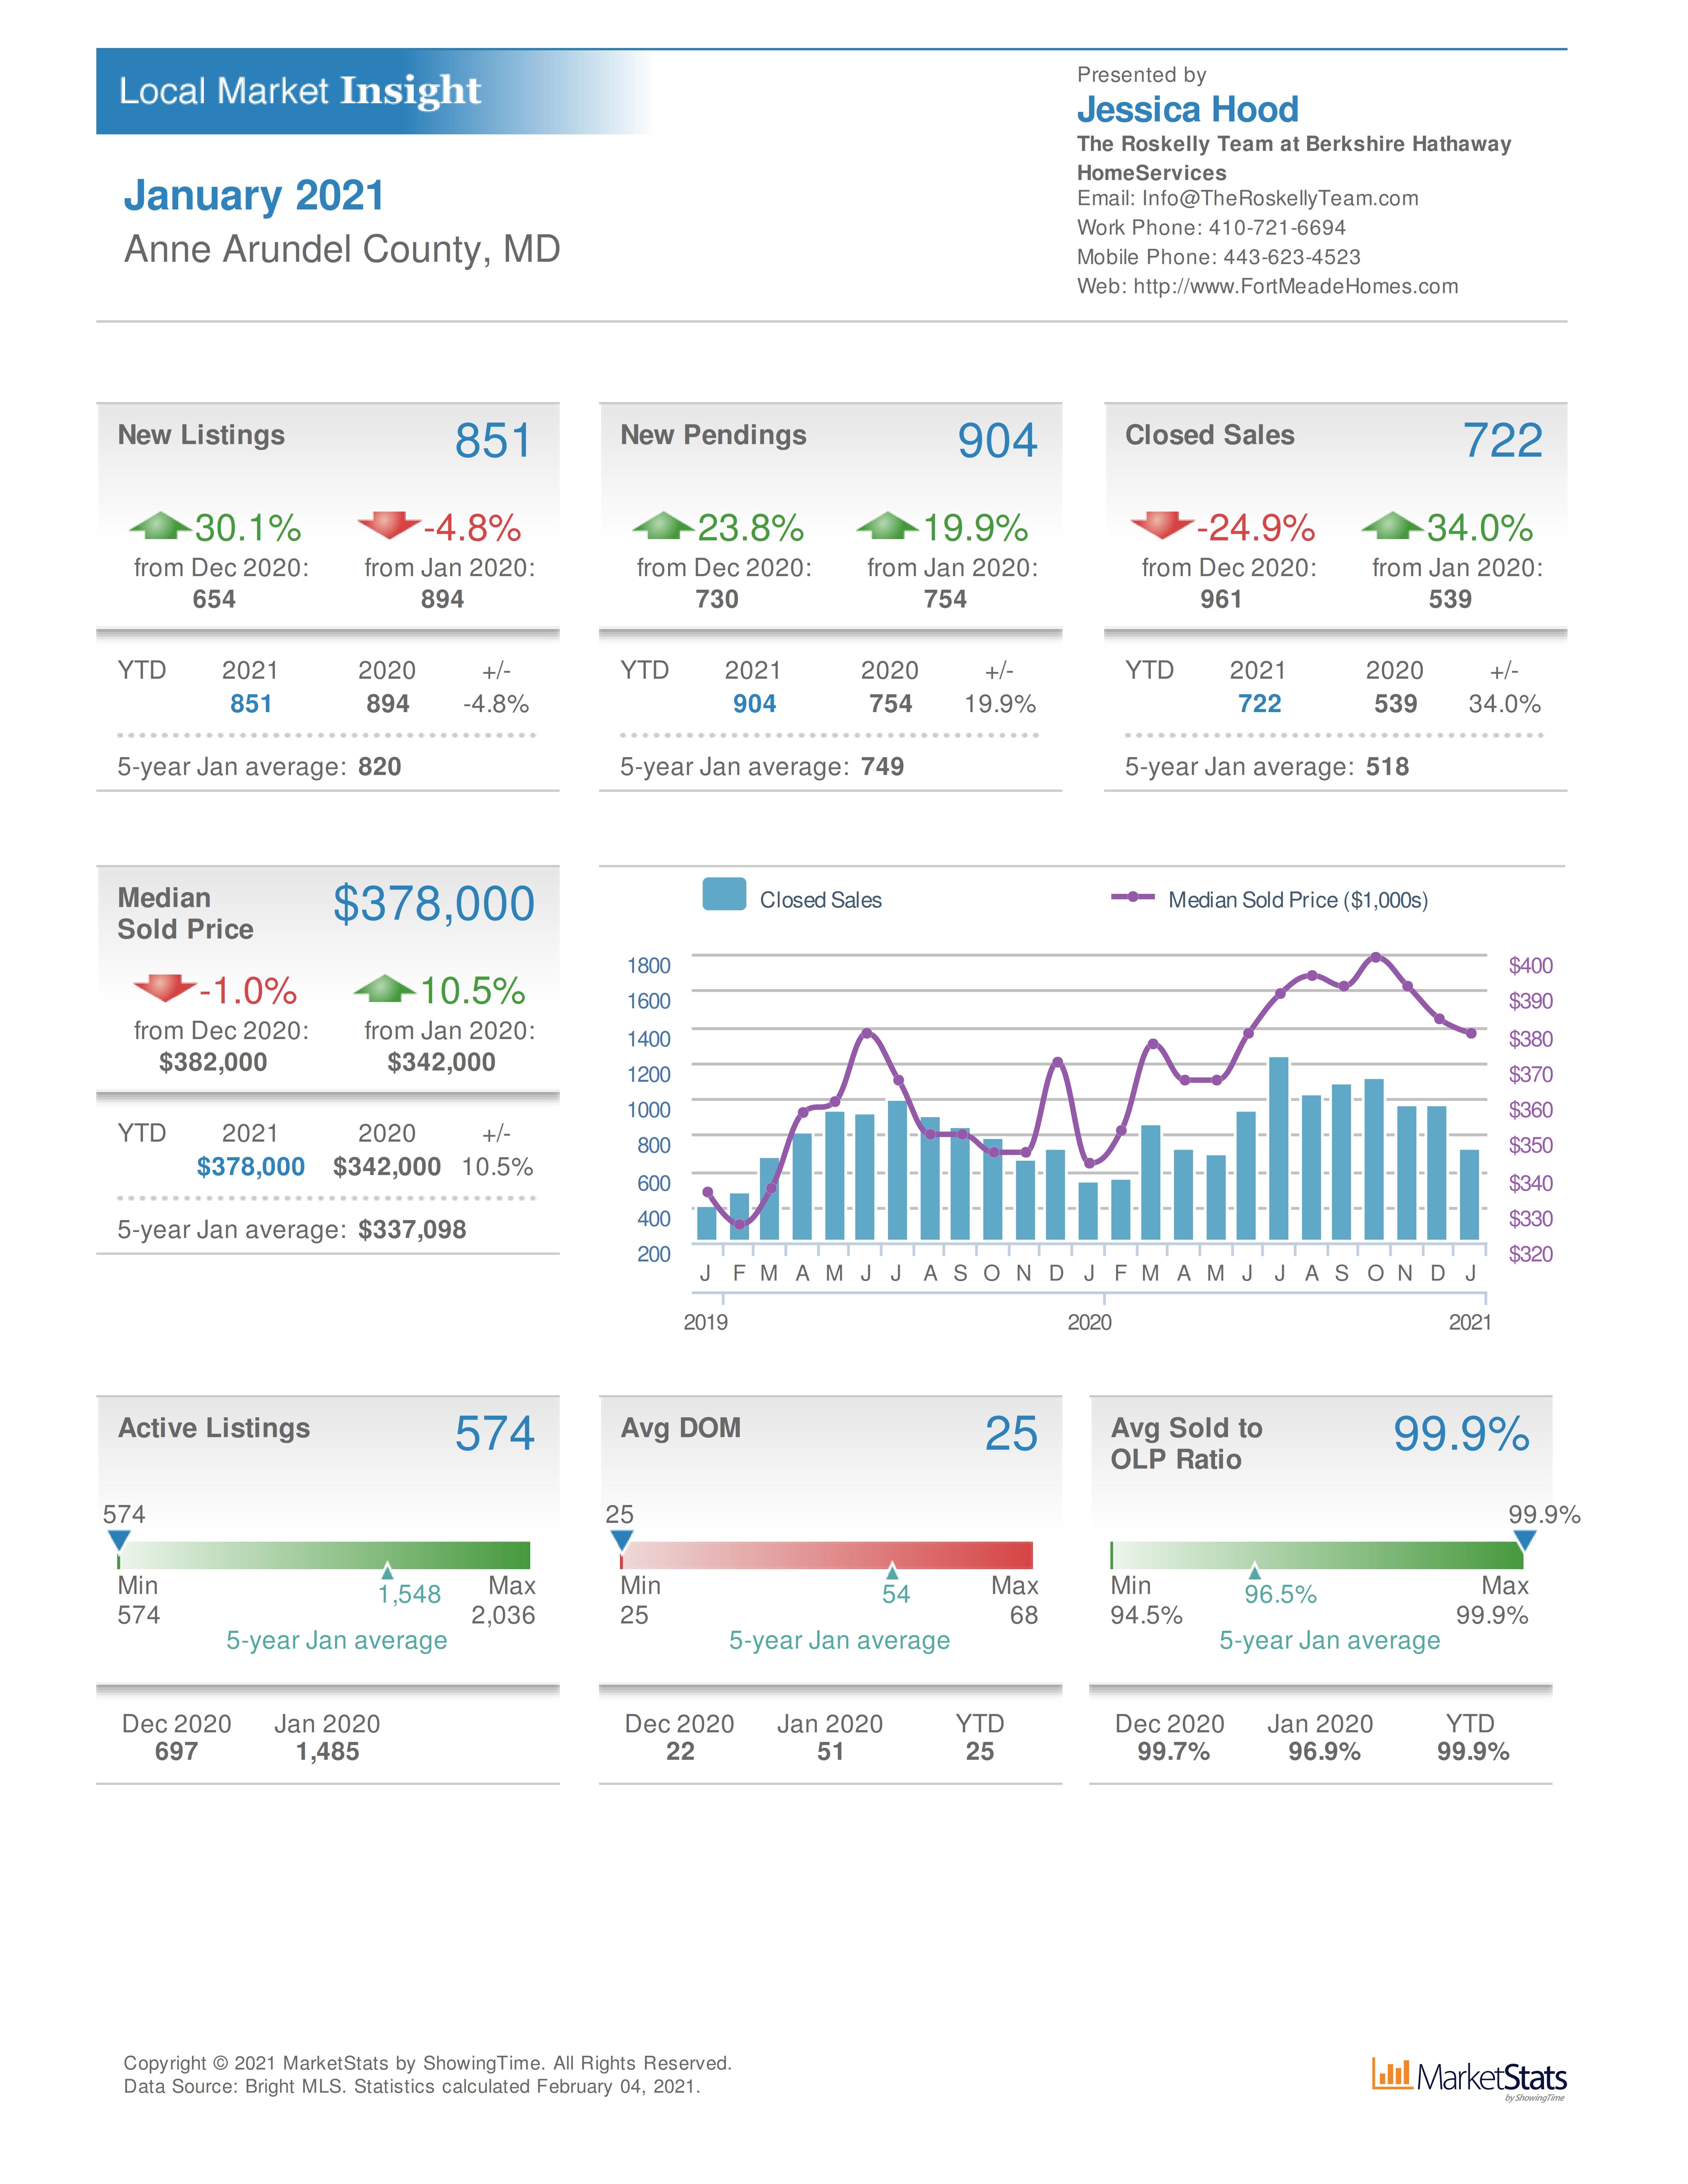 Fort Meade MD area real estate sales